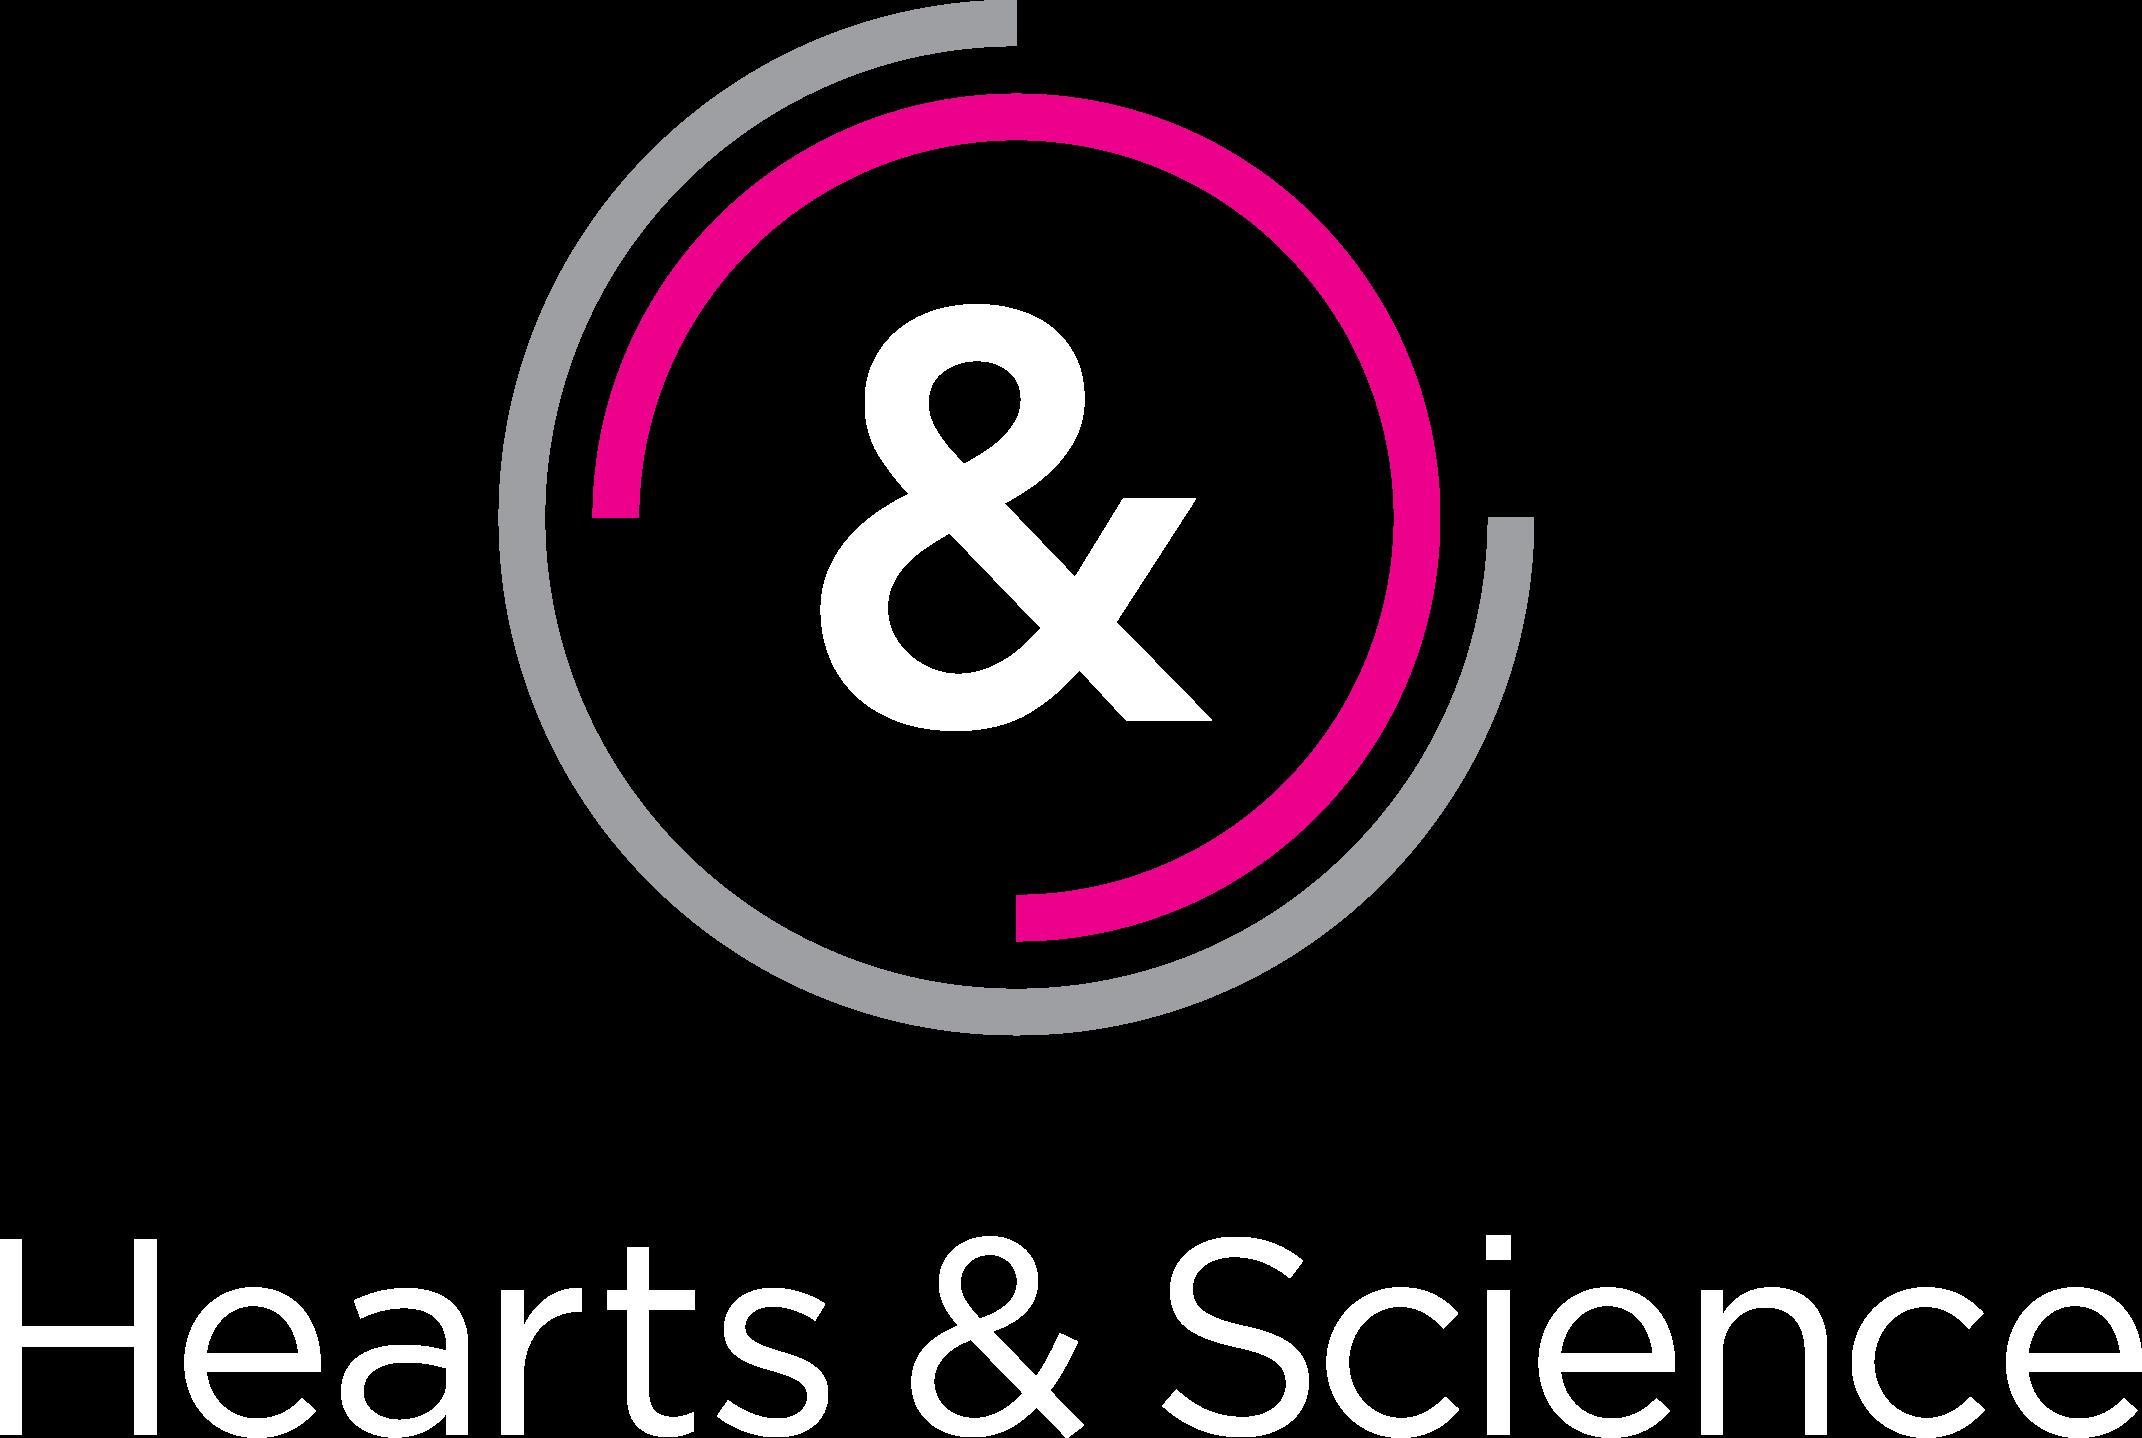 Hearts & Science